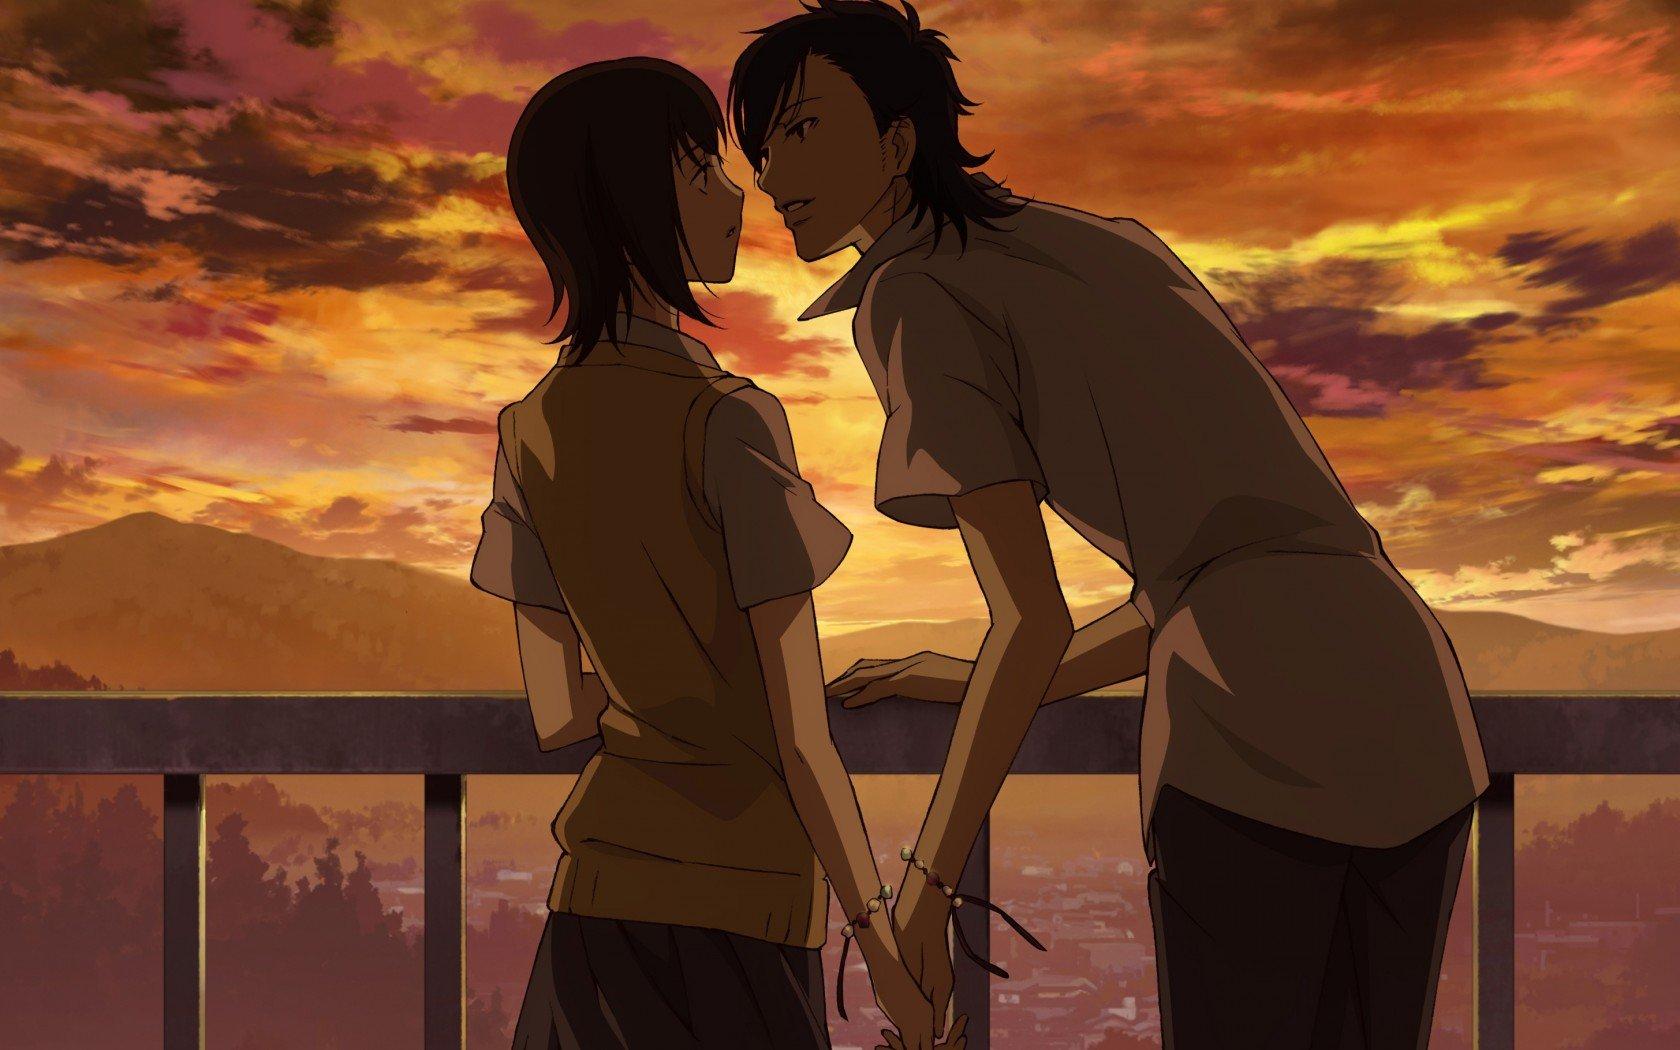 Manga where the girl loves a guy dating the mean girl